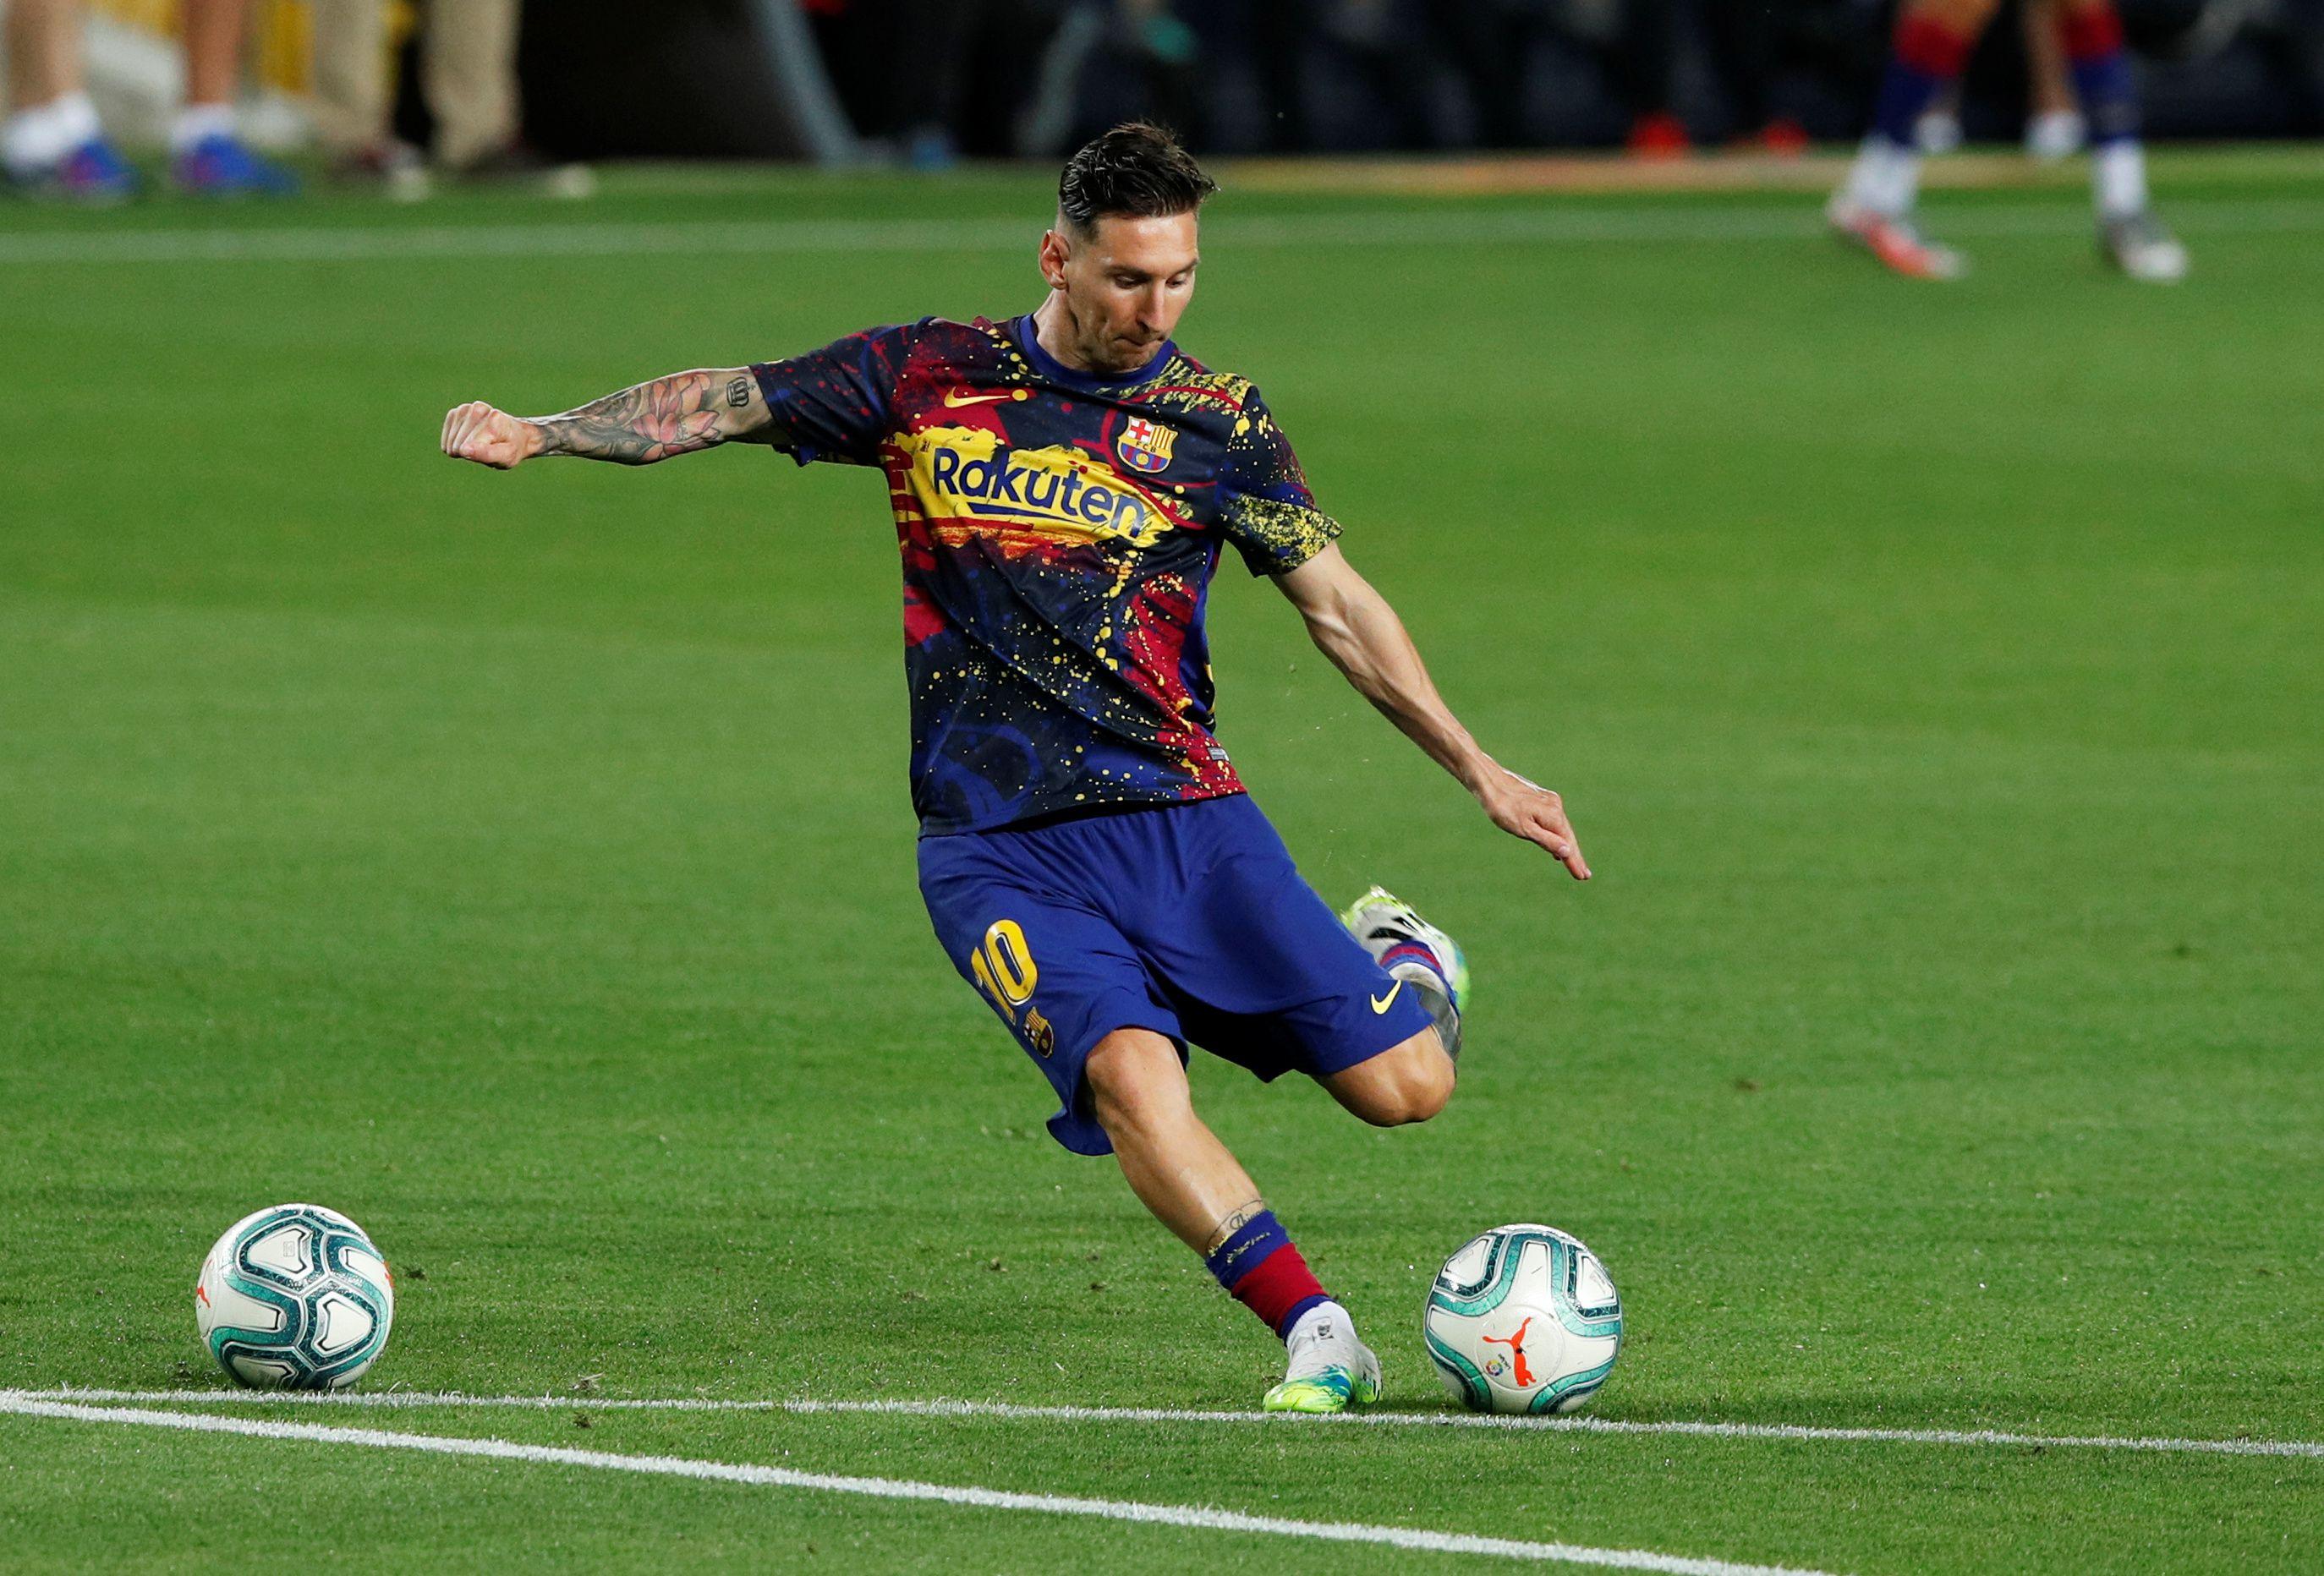 Setién habló sobre la situación de Lionel Messi (REUTERS/Albert Gea)